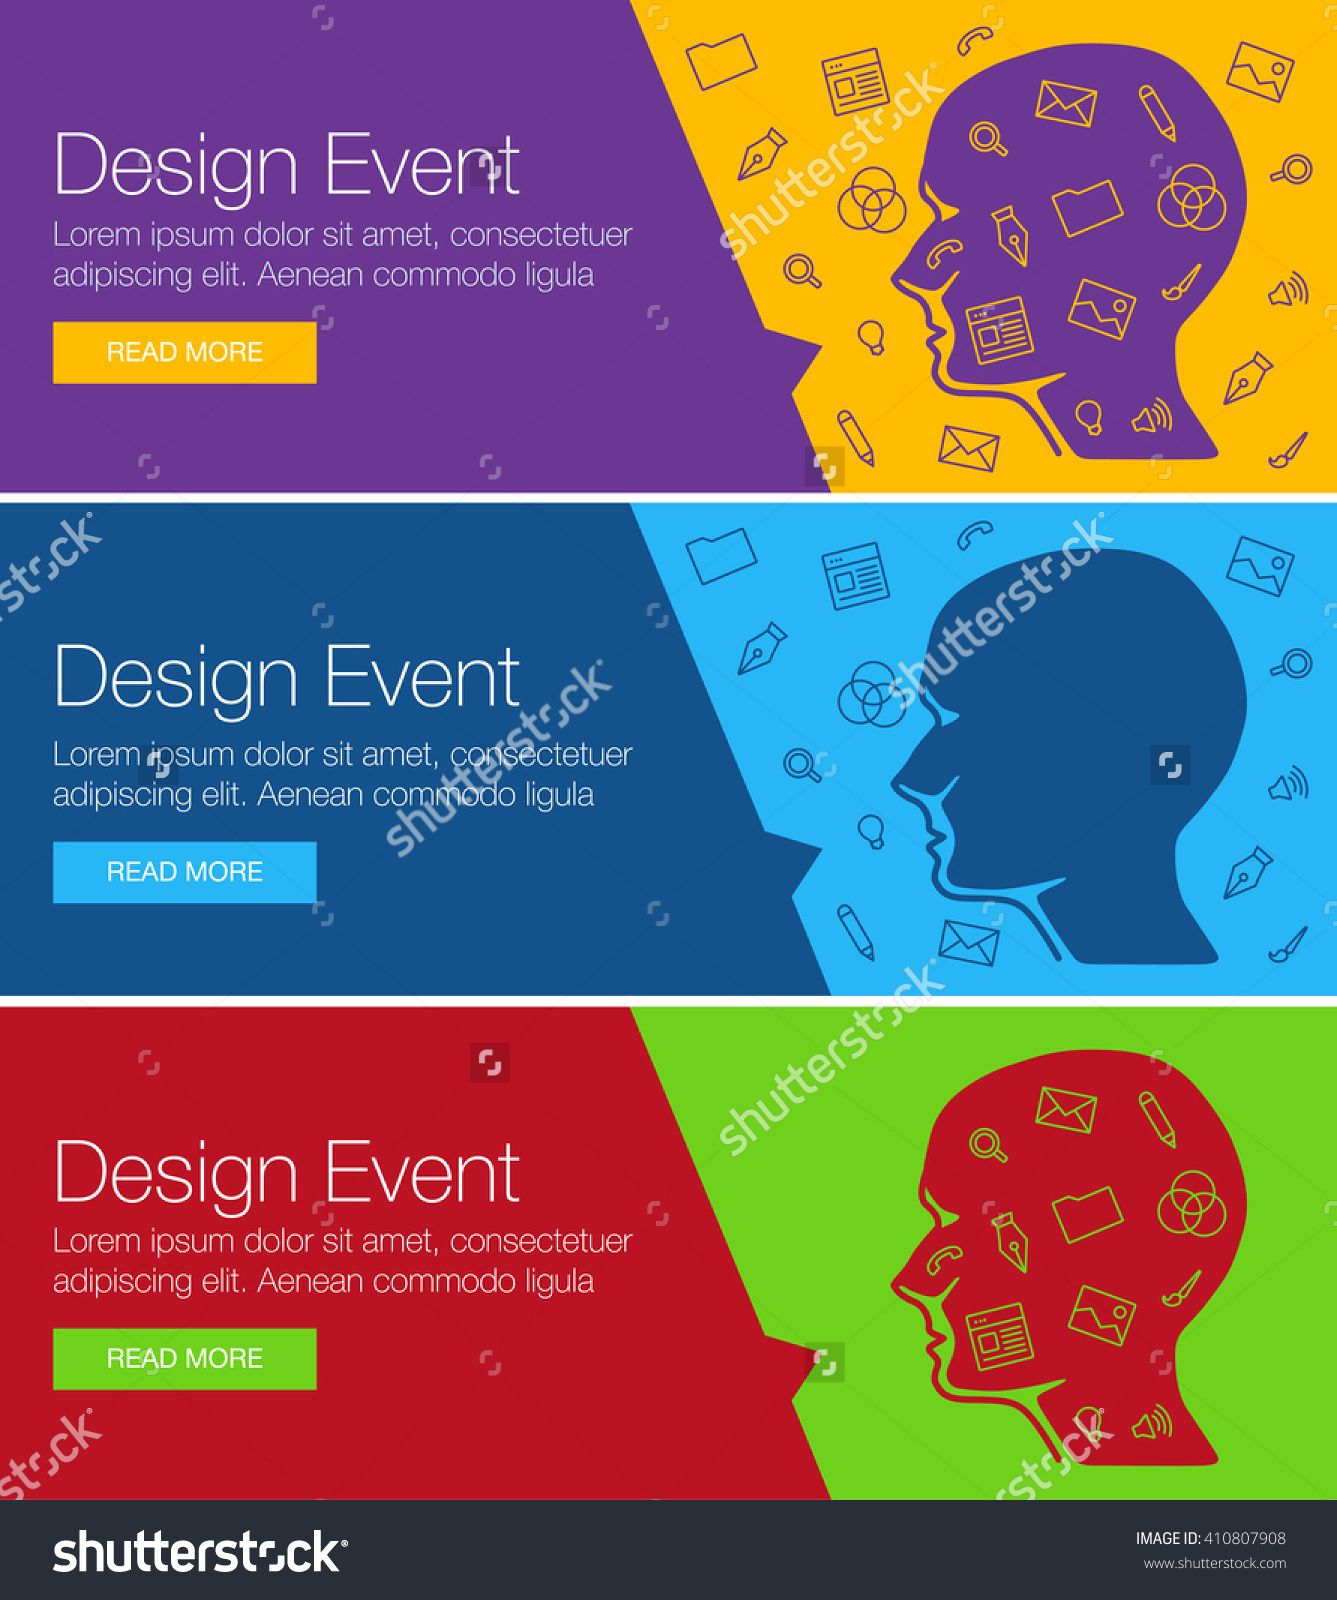 Poster design for event online course training workshop banner design of ideas